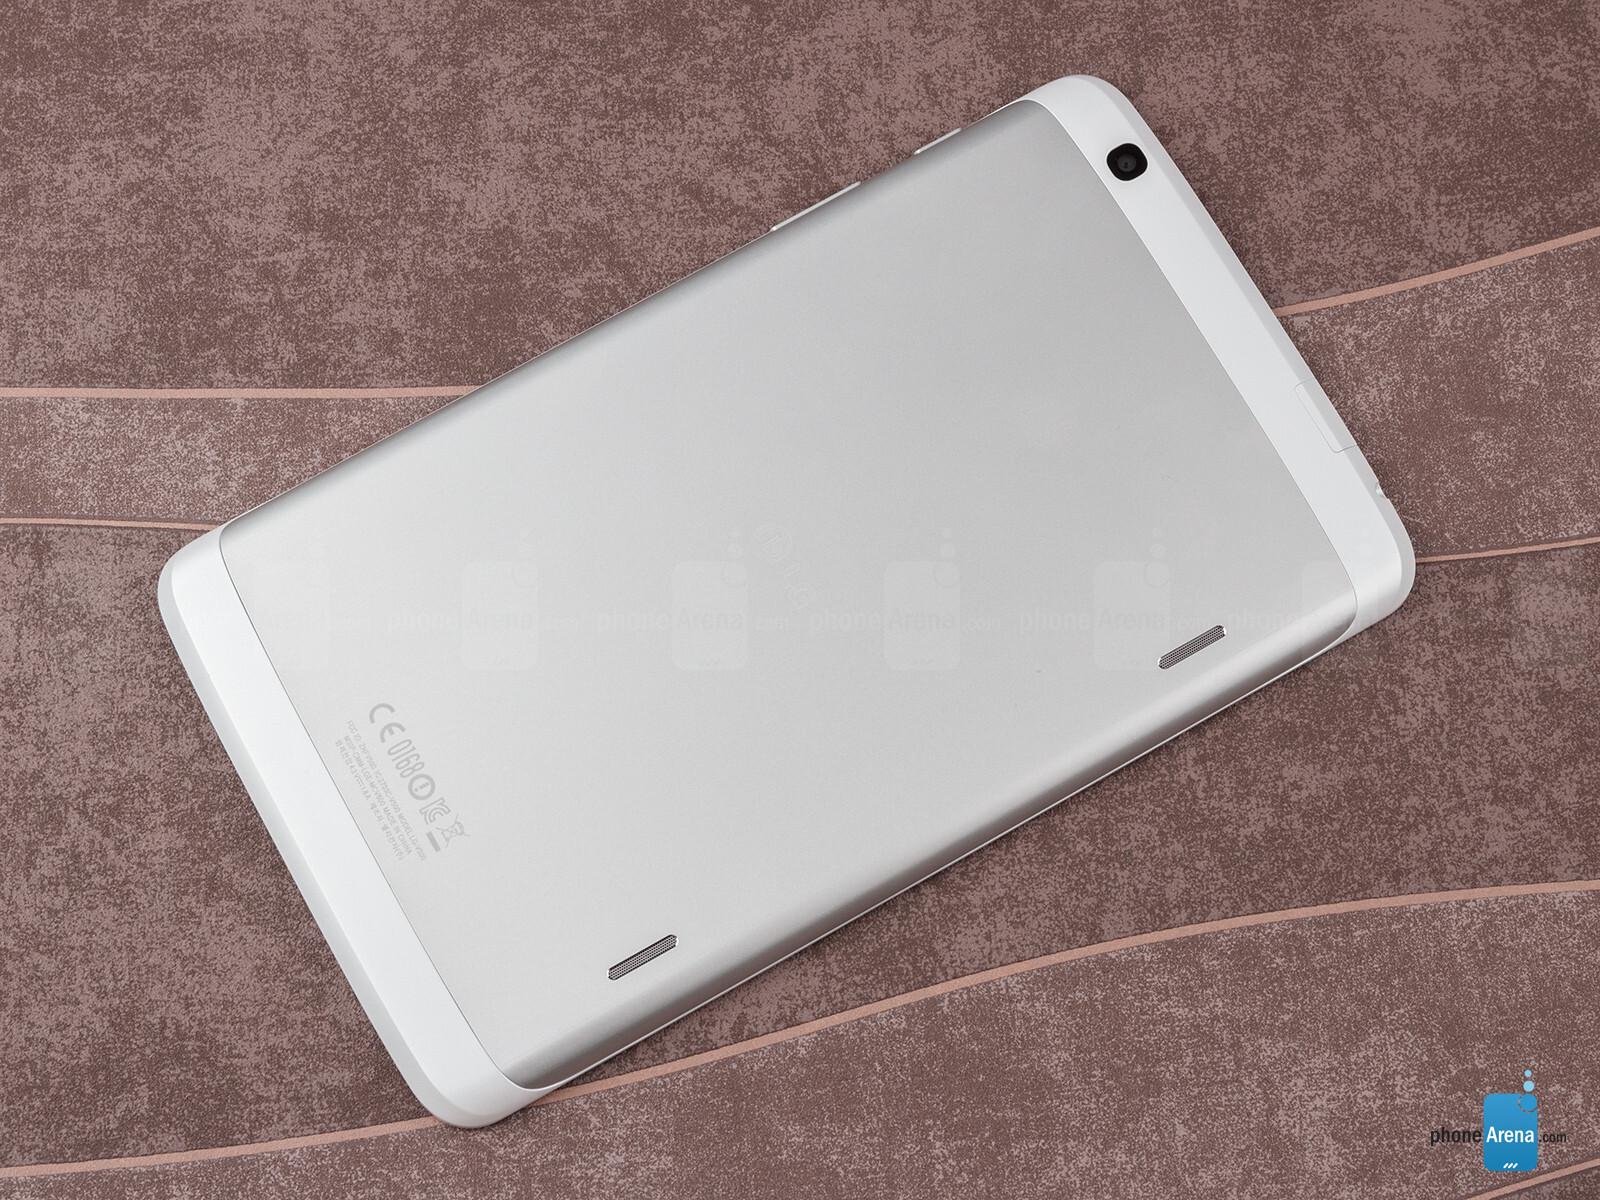 LG G Pad 8.3 Review